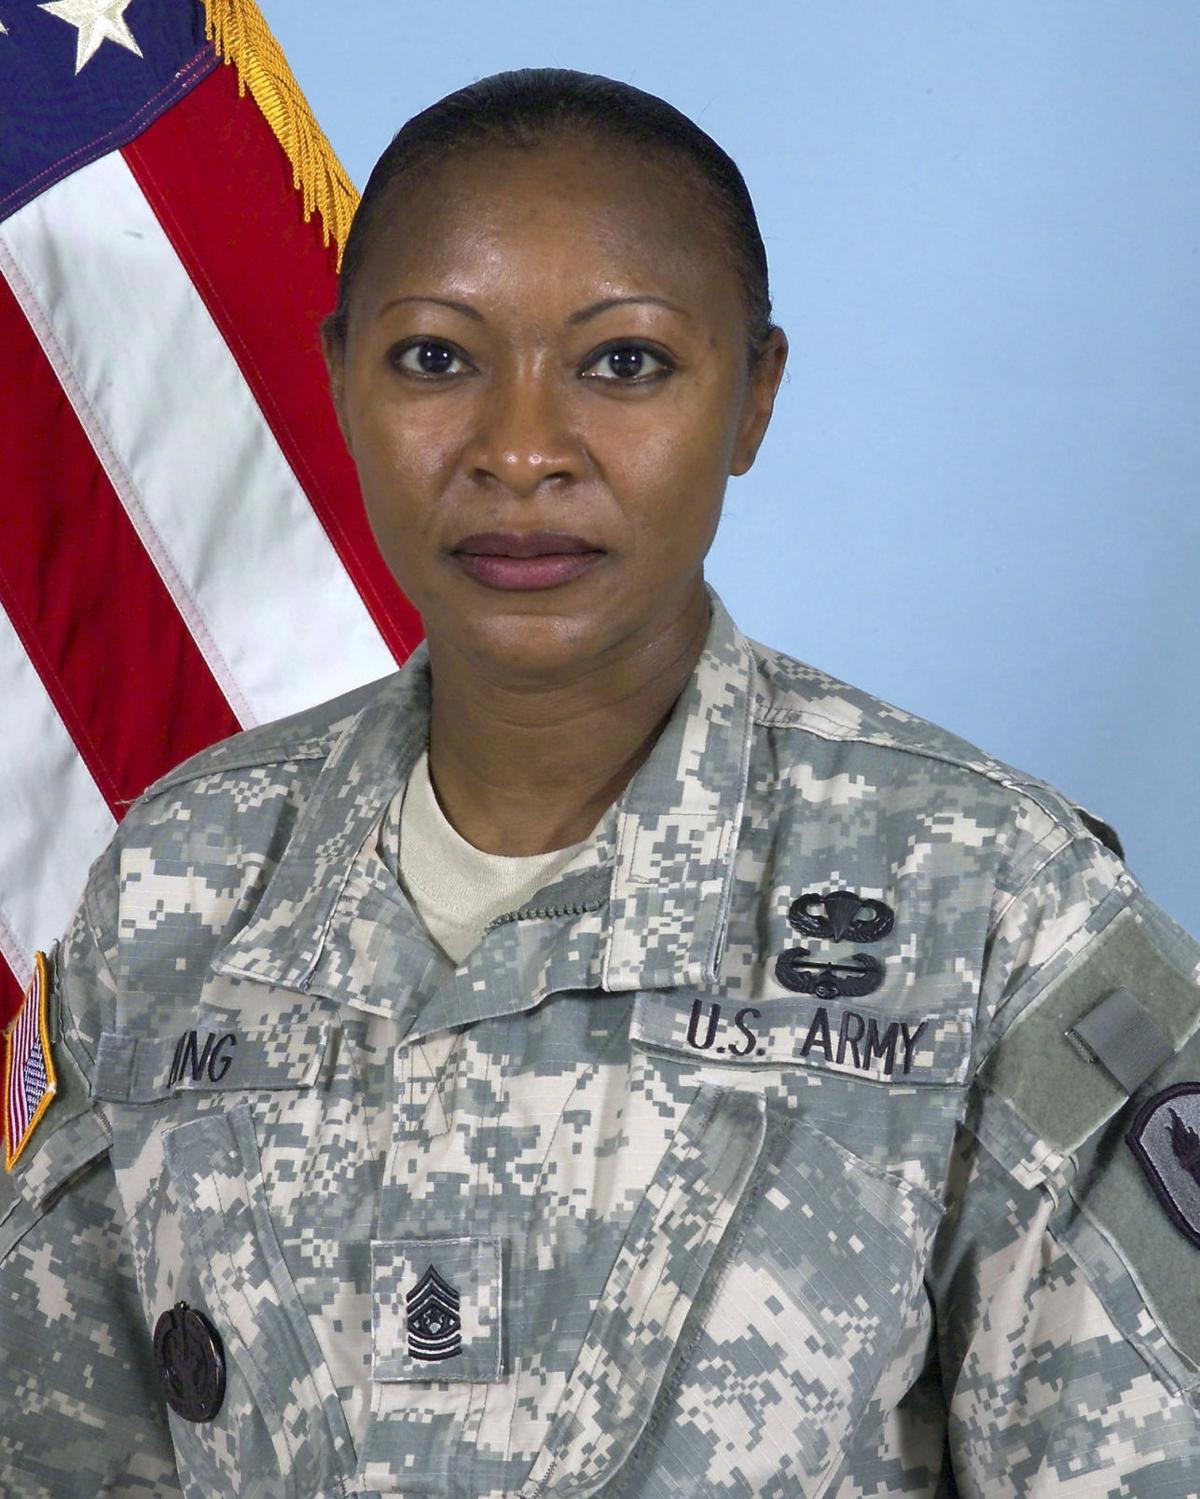 BC-SC--Drill Sergeant-Commandant, 1st Ld-Writethru,525<\n>Retired female Army drill sergeant commander sues